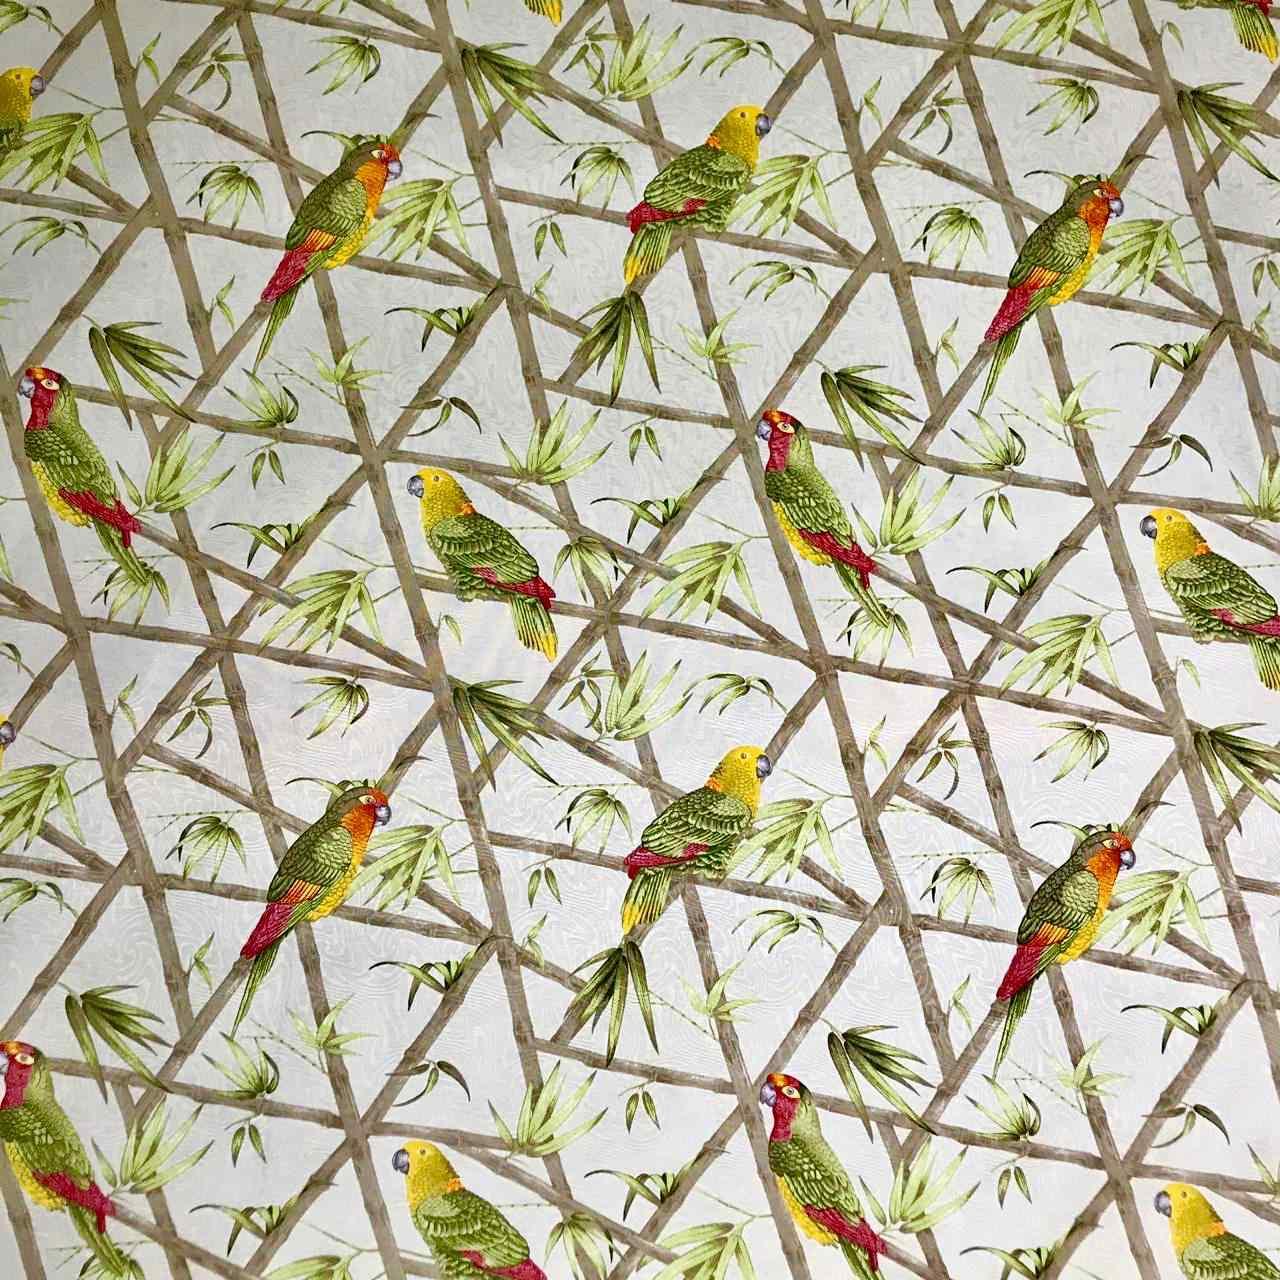 Tecido Jacquard Estampa Papagaios - 1.40m de Largura